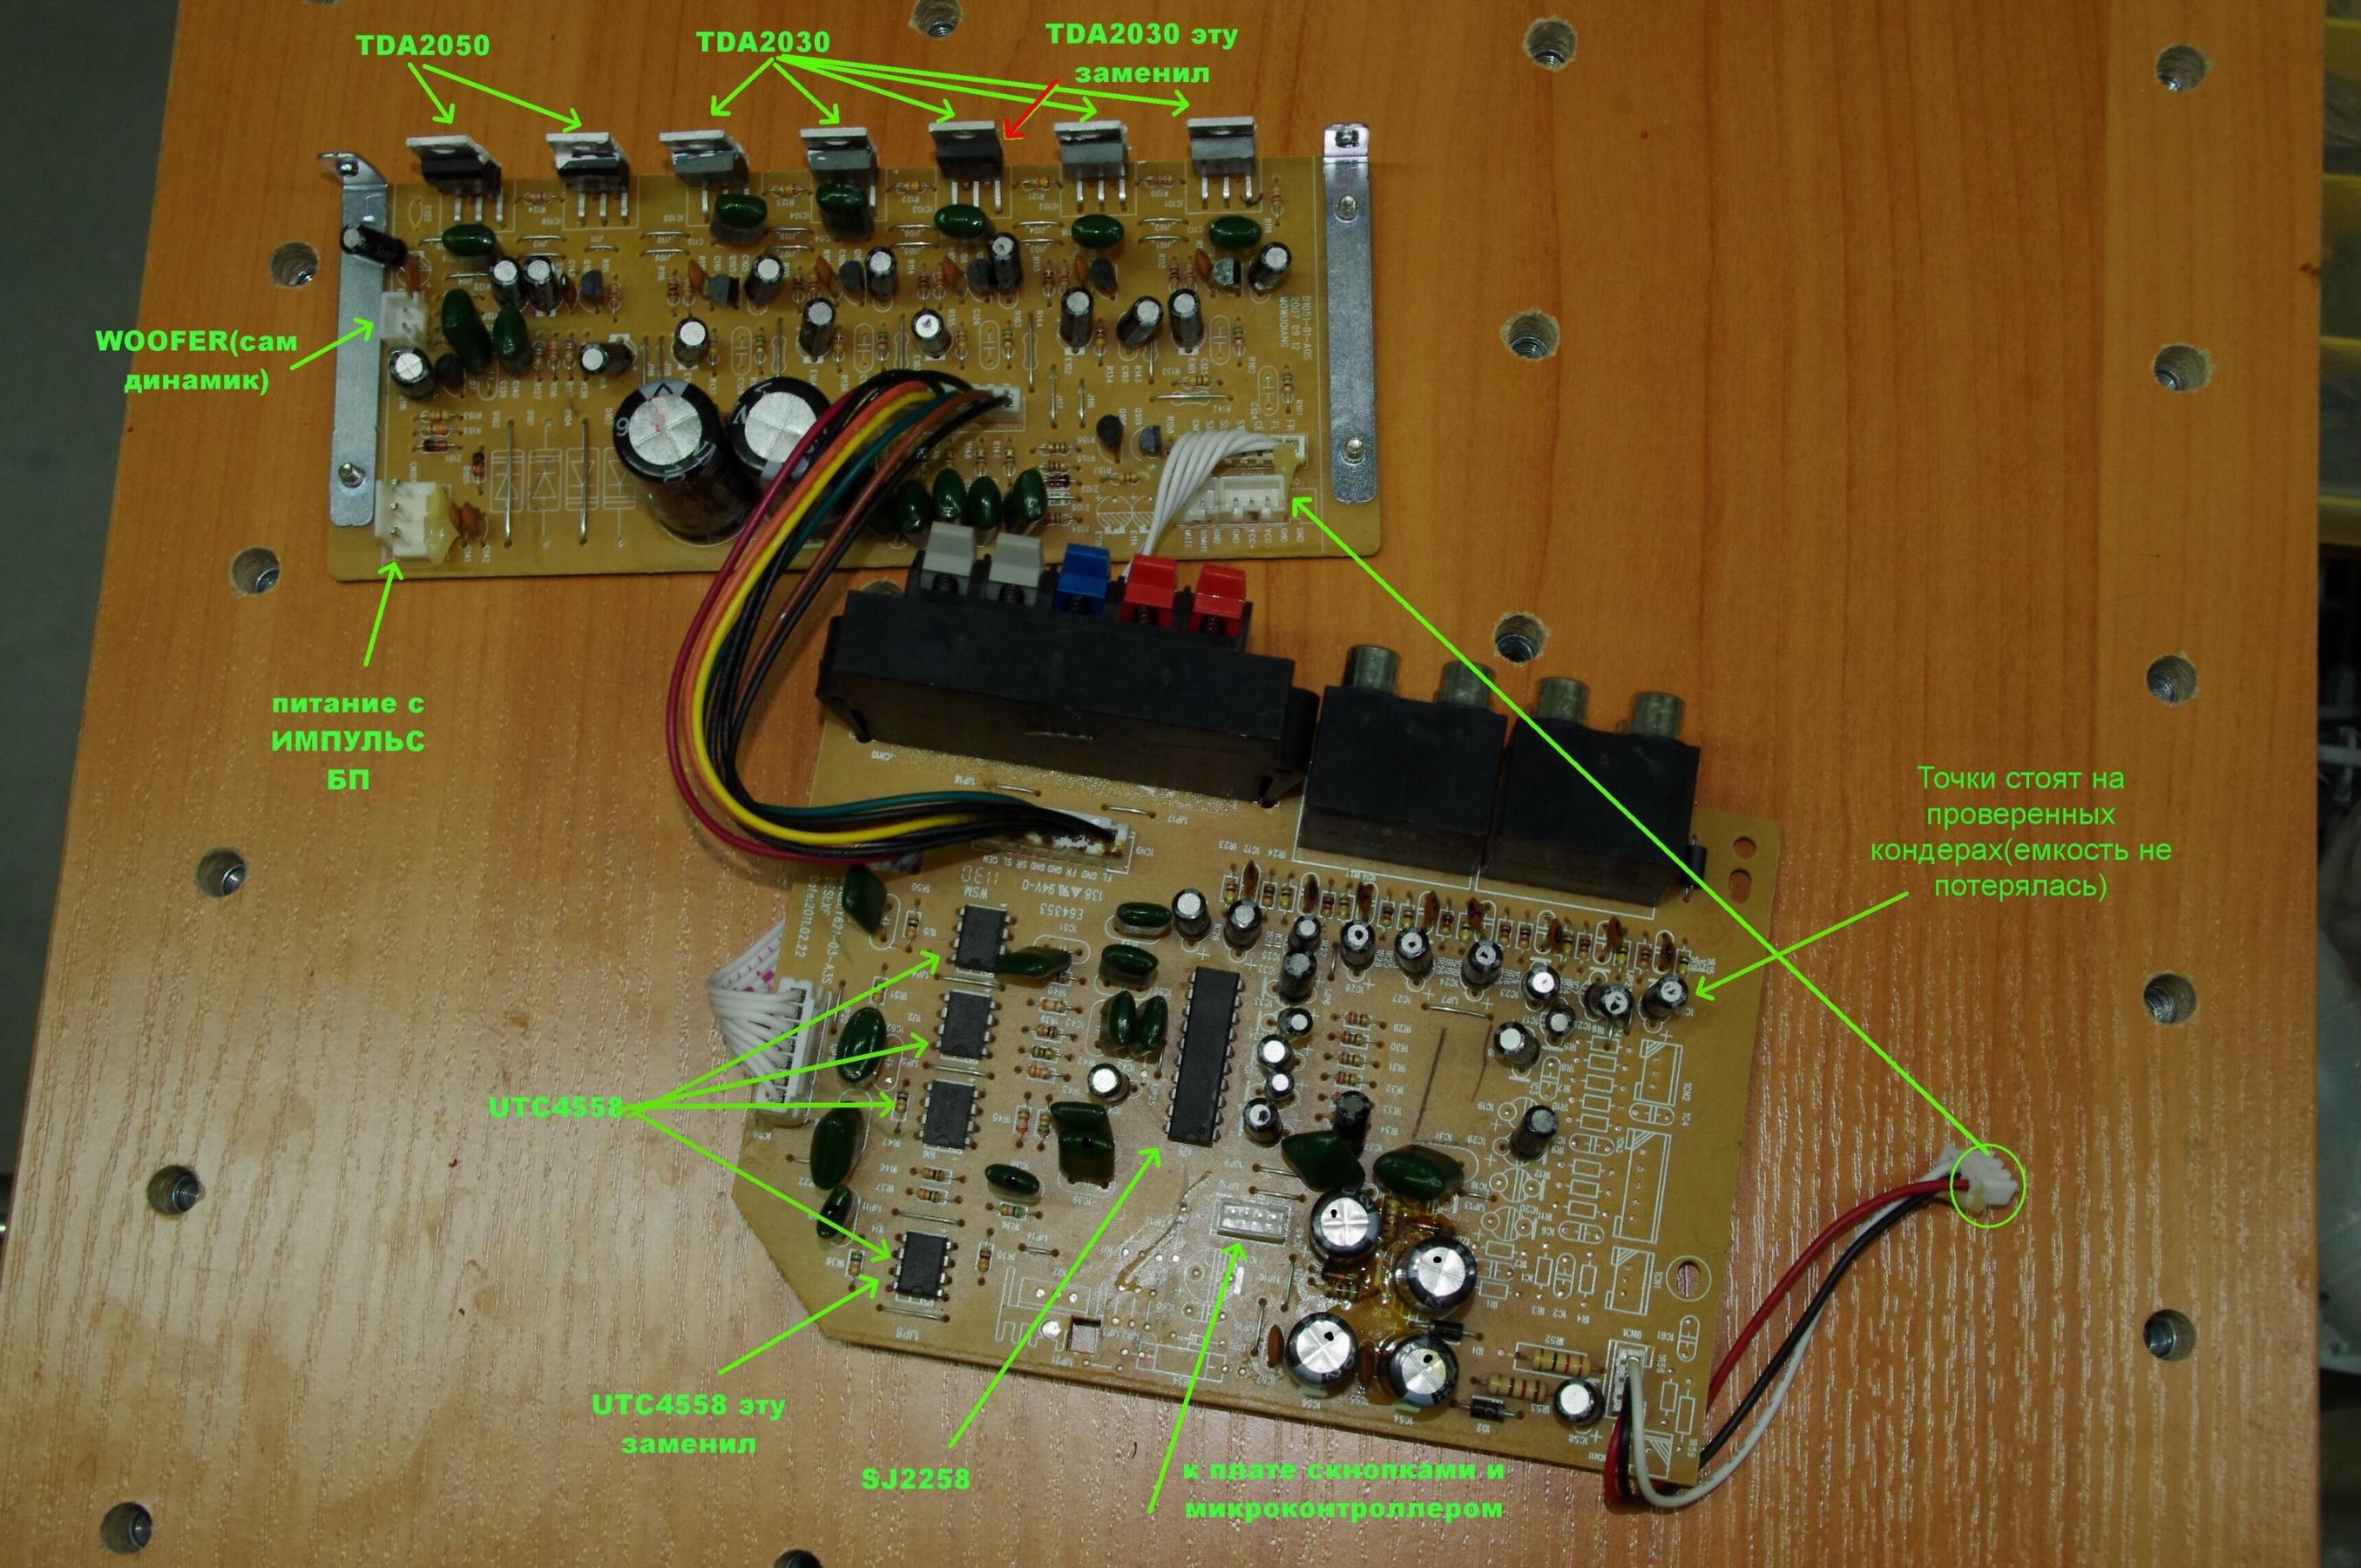 Ремонт акустики sven ihoo mt 5. 1 аудиоаппаратура форум по.